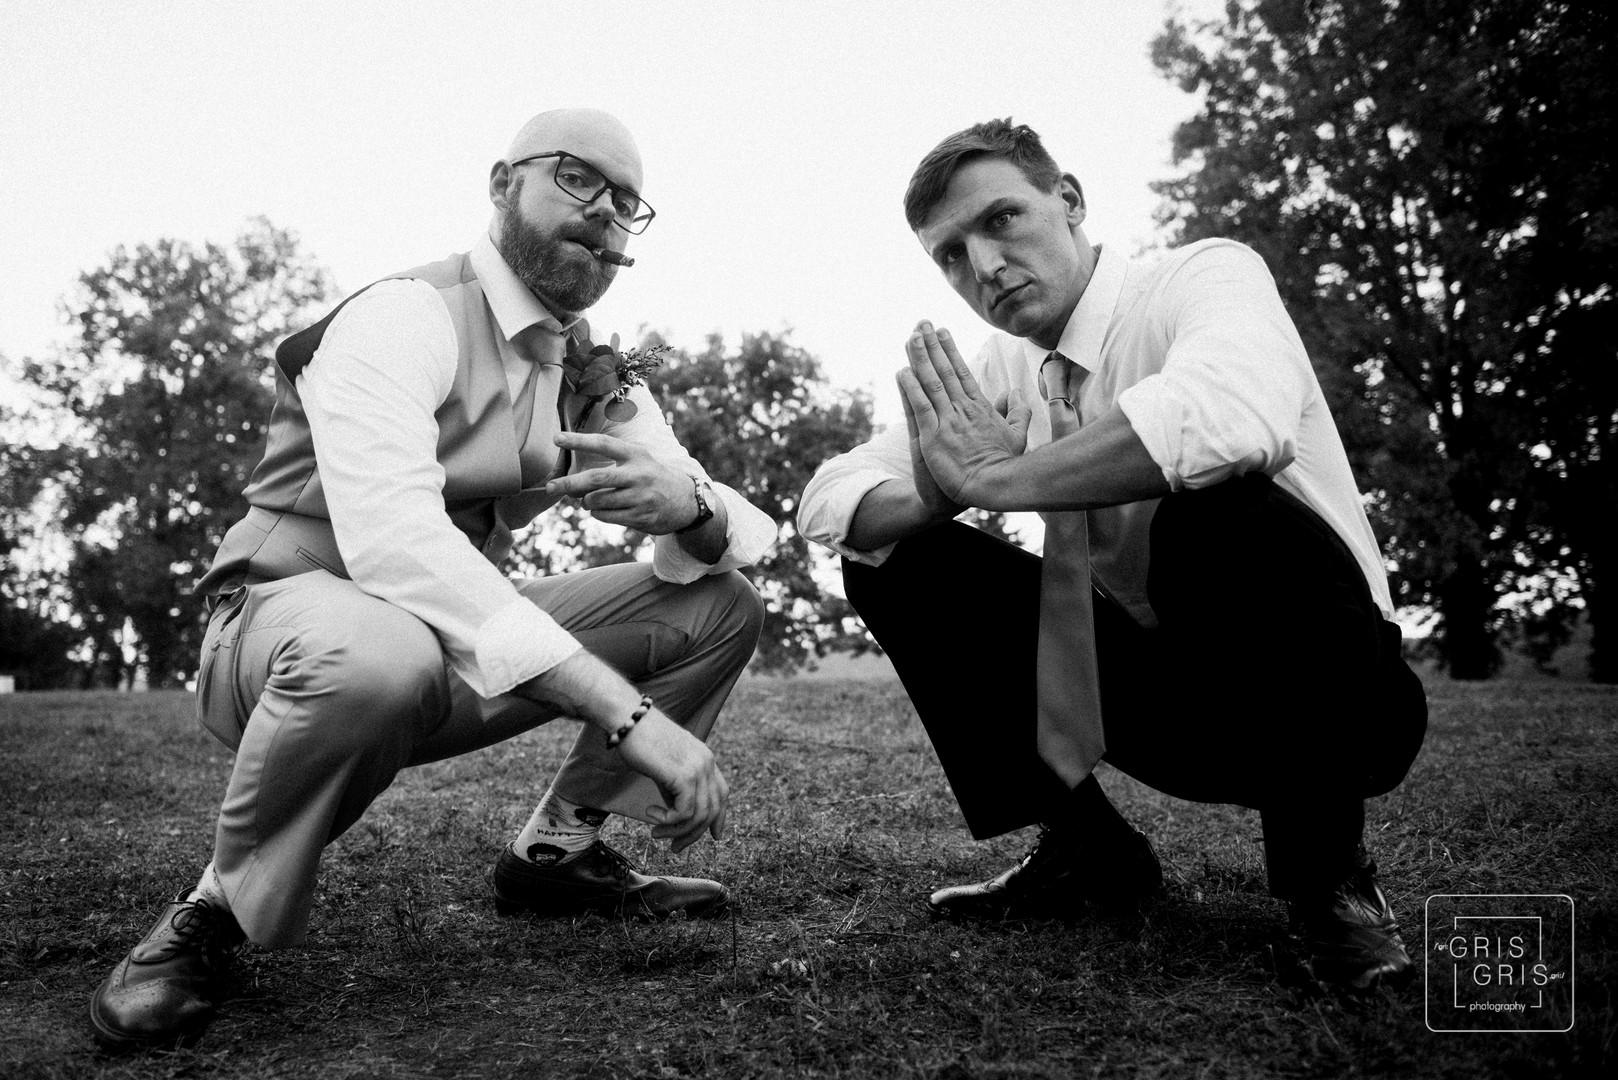 two groomsmen strike gangster pose on durring their best freinds wedding